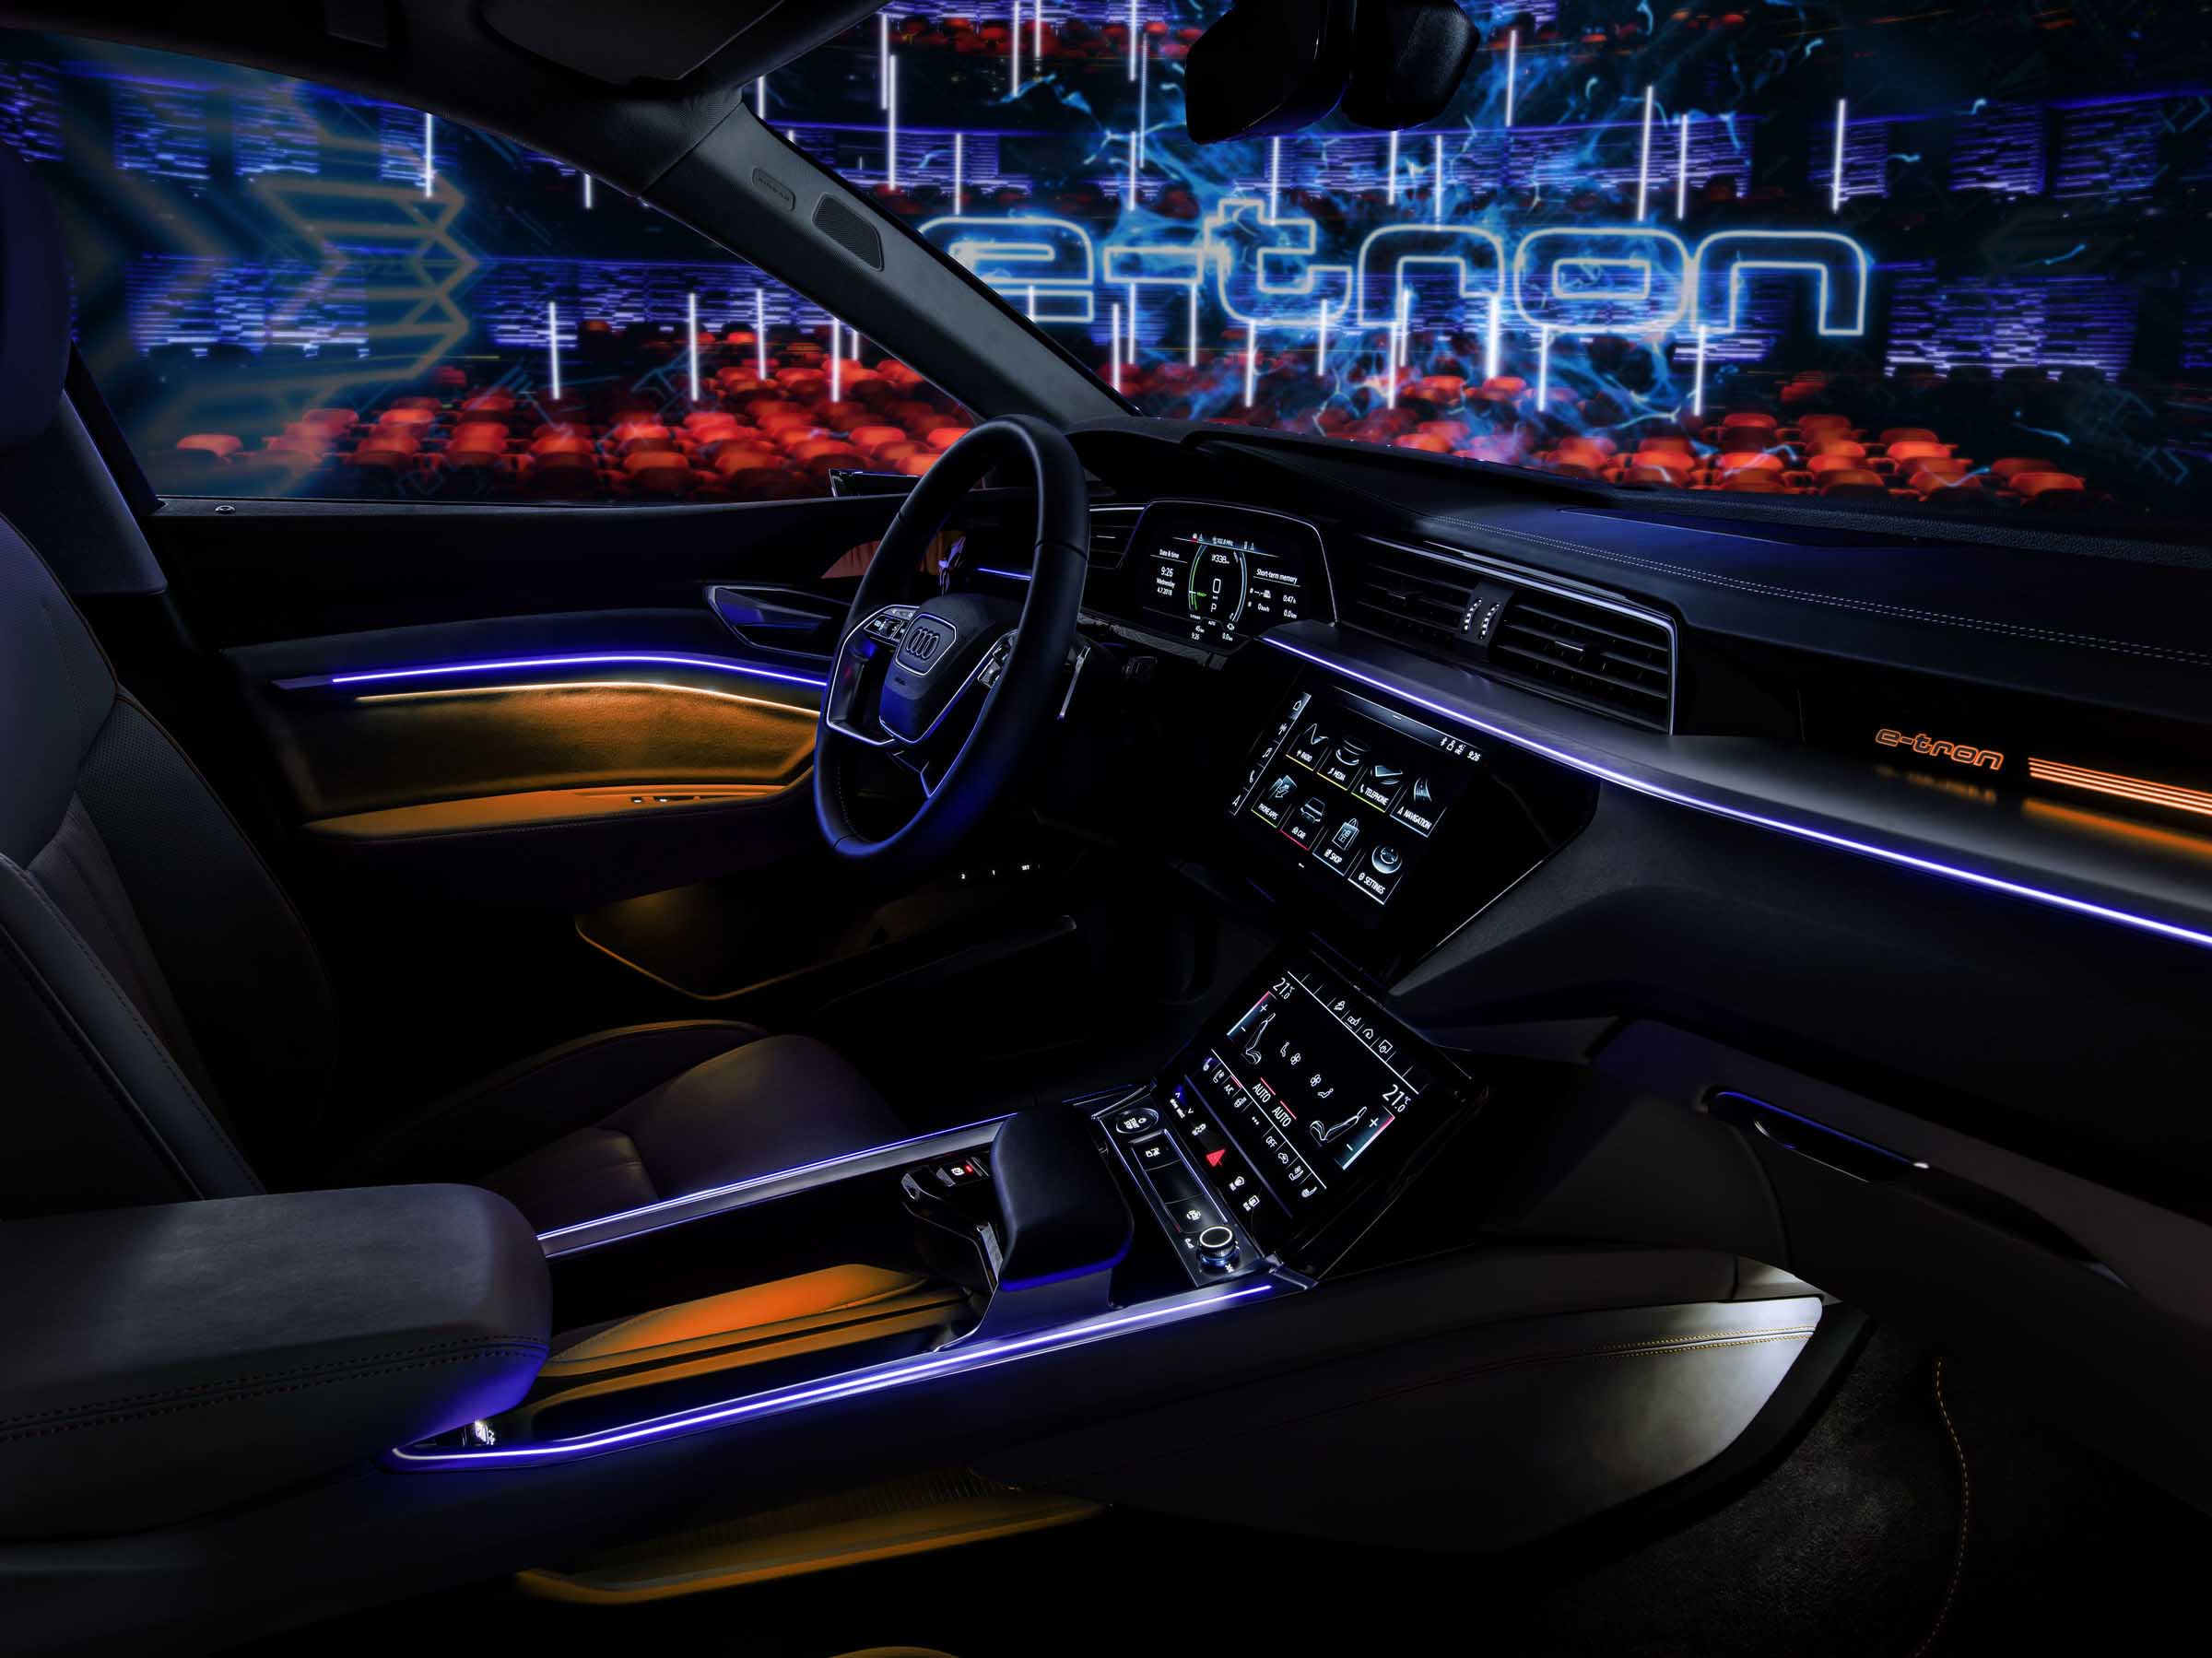 A187615 overfull - Erstes Audi Elektroauto: Audi e-tron feiert sonnige Supersause in Kopenhagen